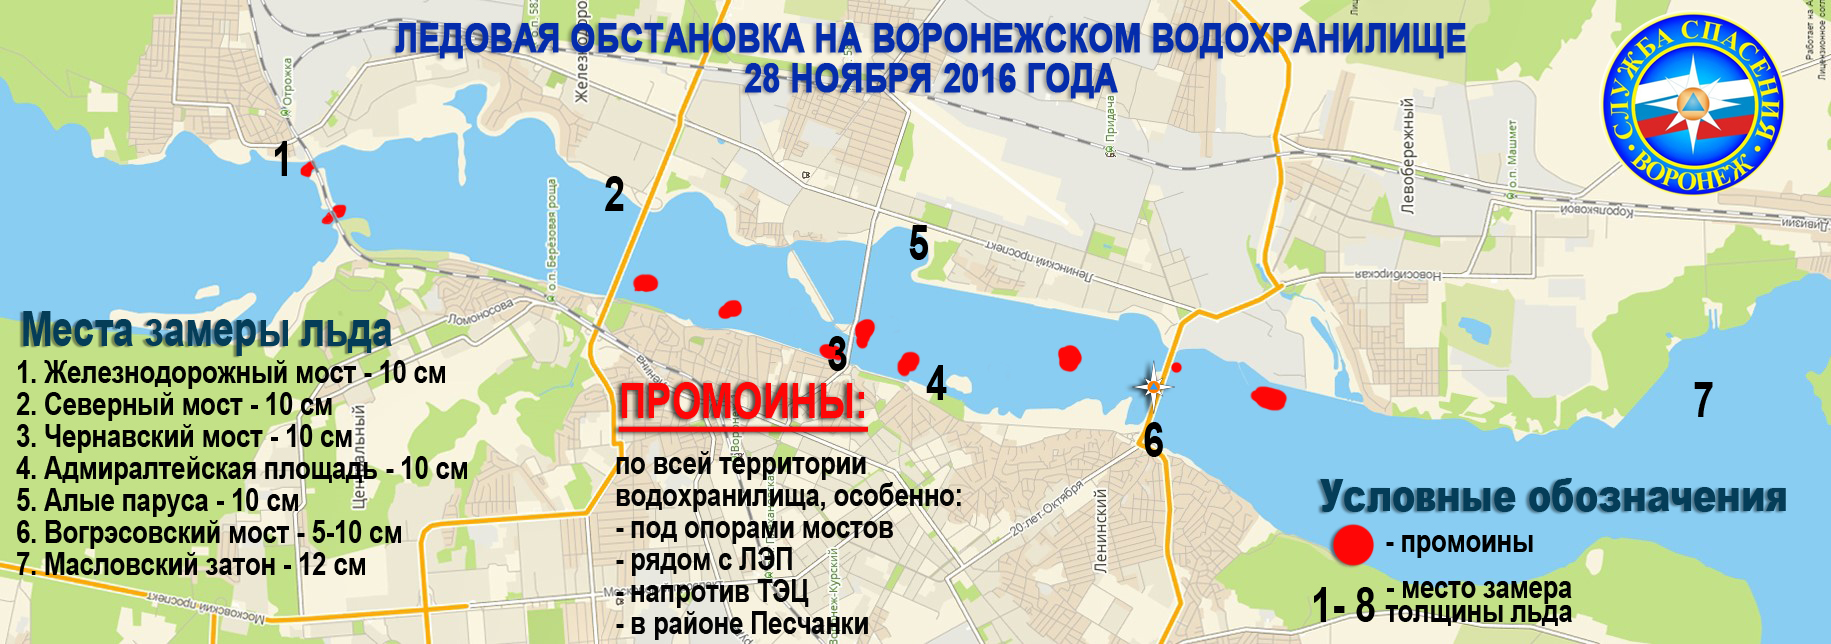 http://s6.uploads.ru/XLF6Z.jpg